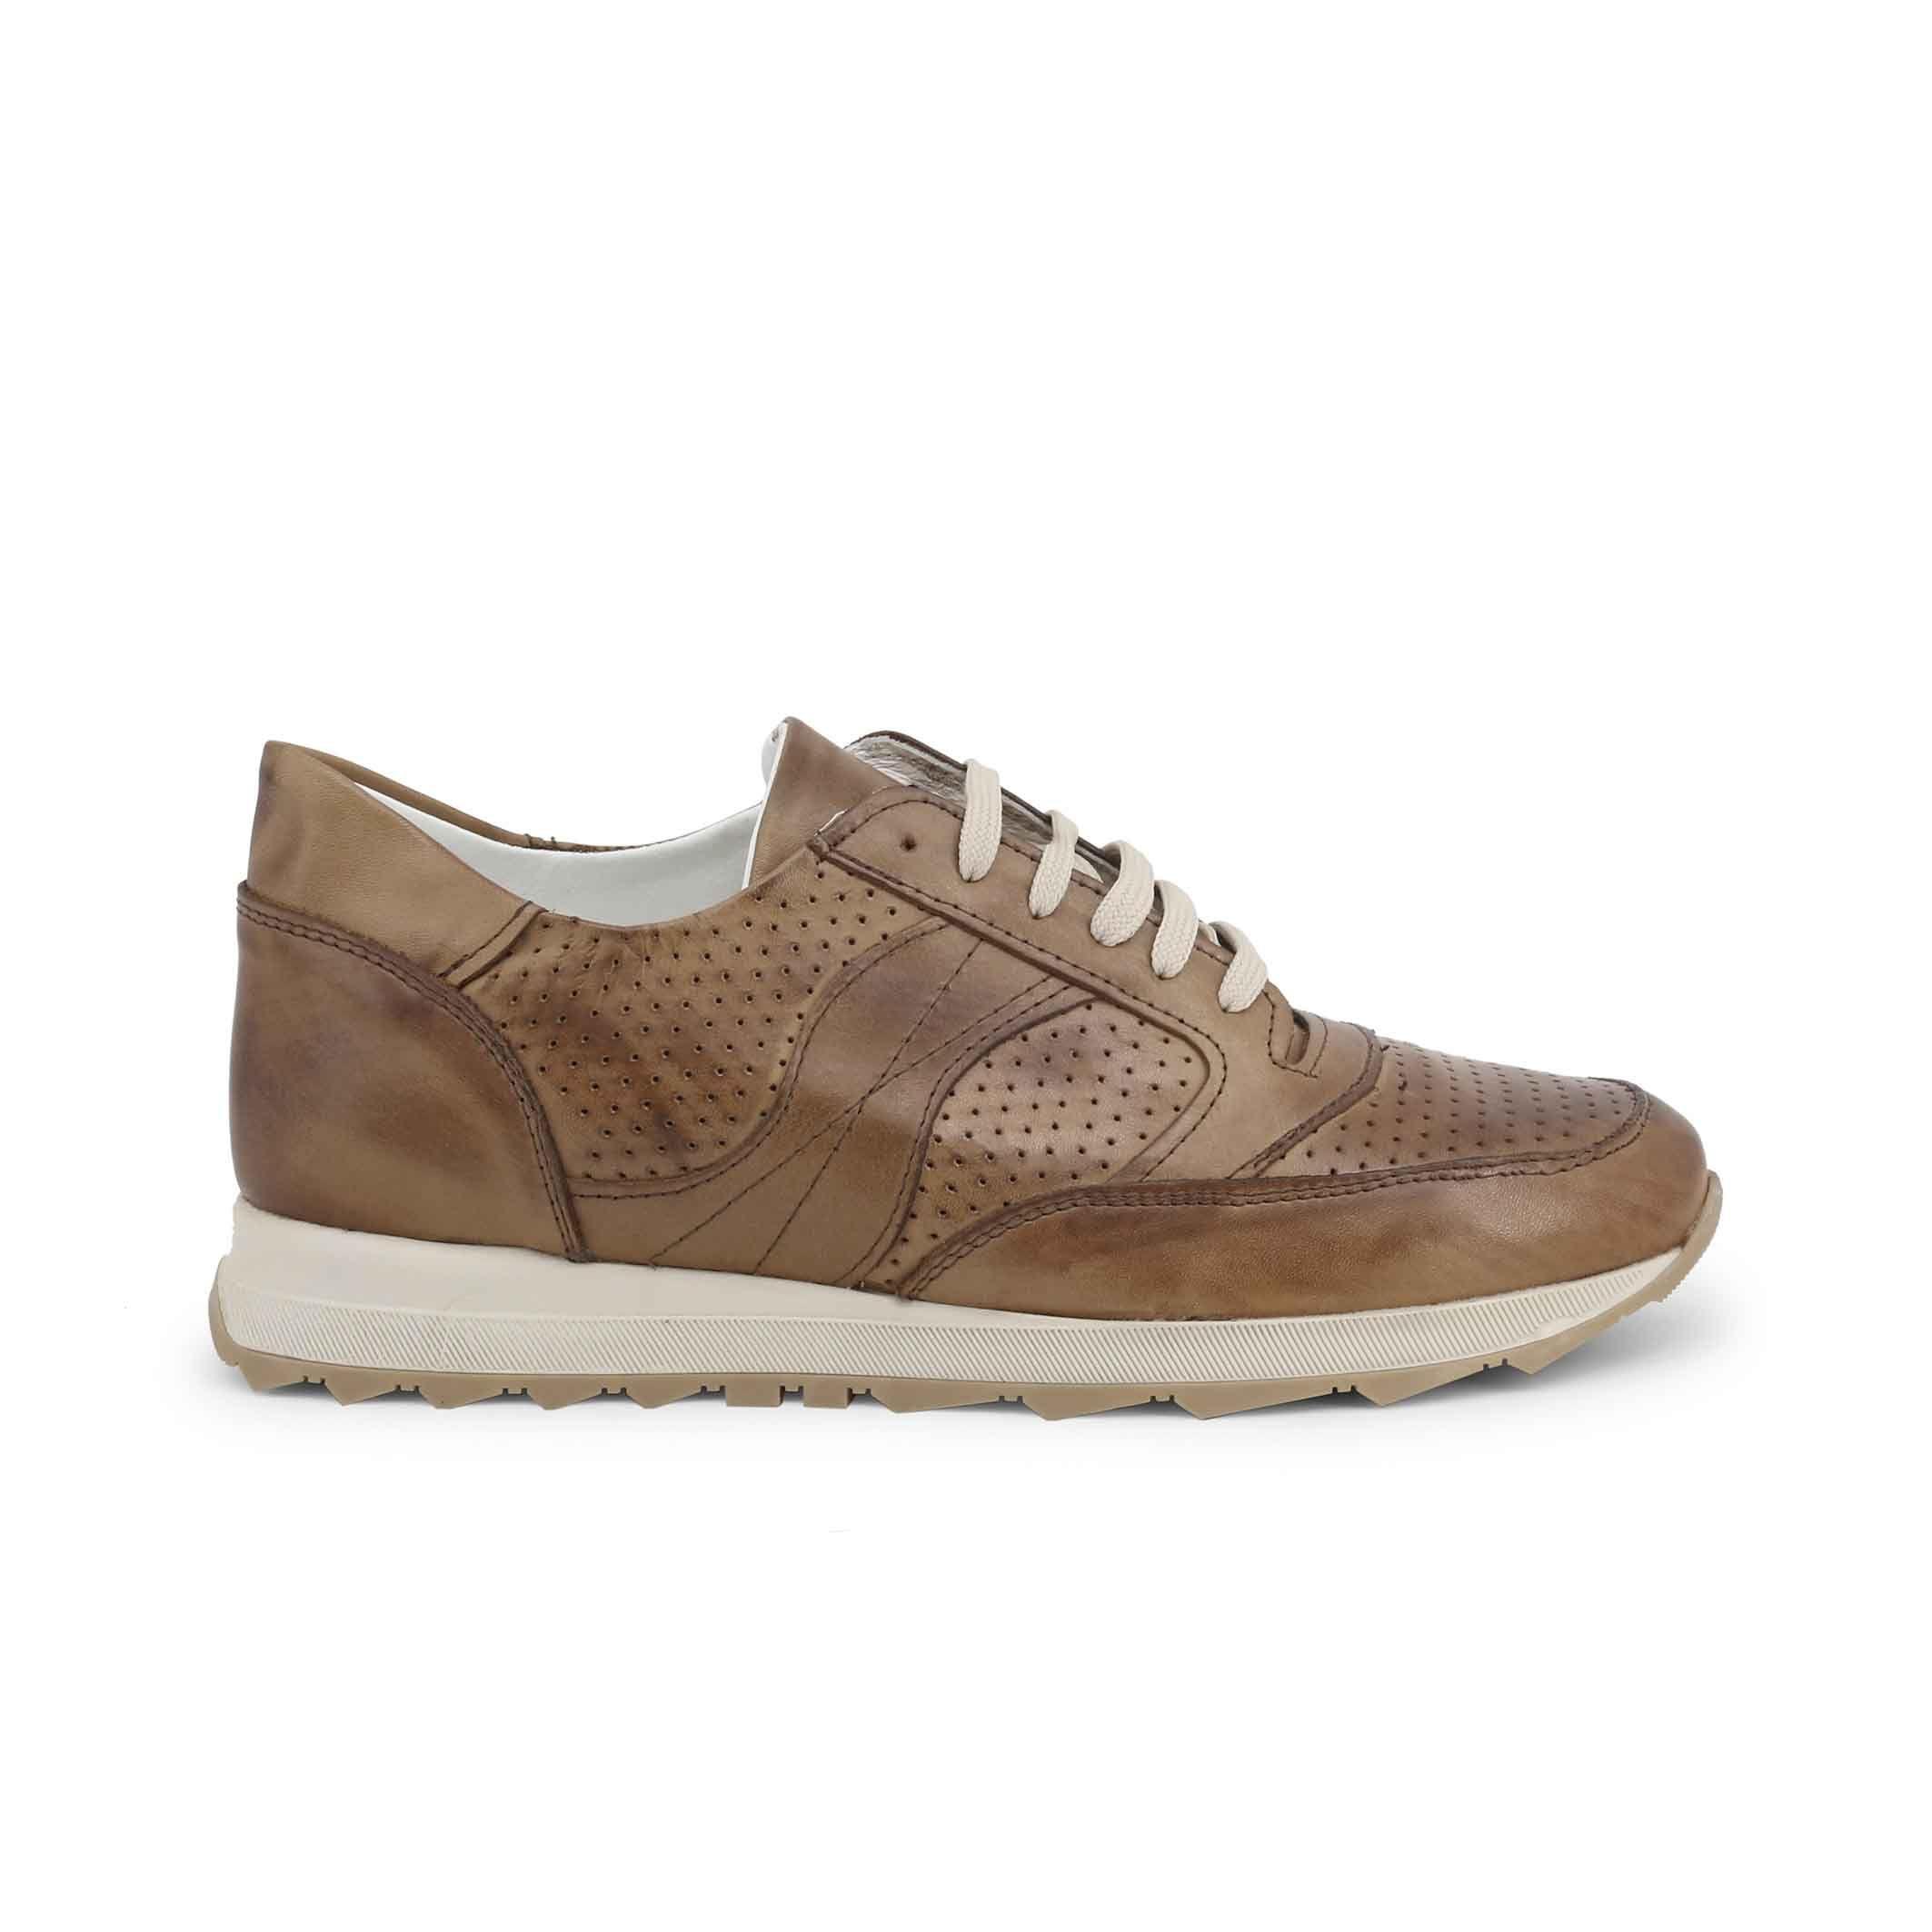 Schuhe SB 3012 – 405_CRUST – Braun